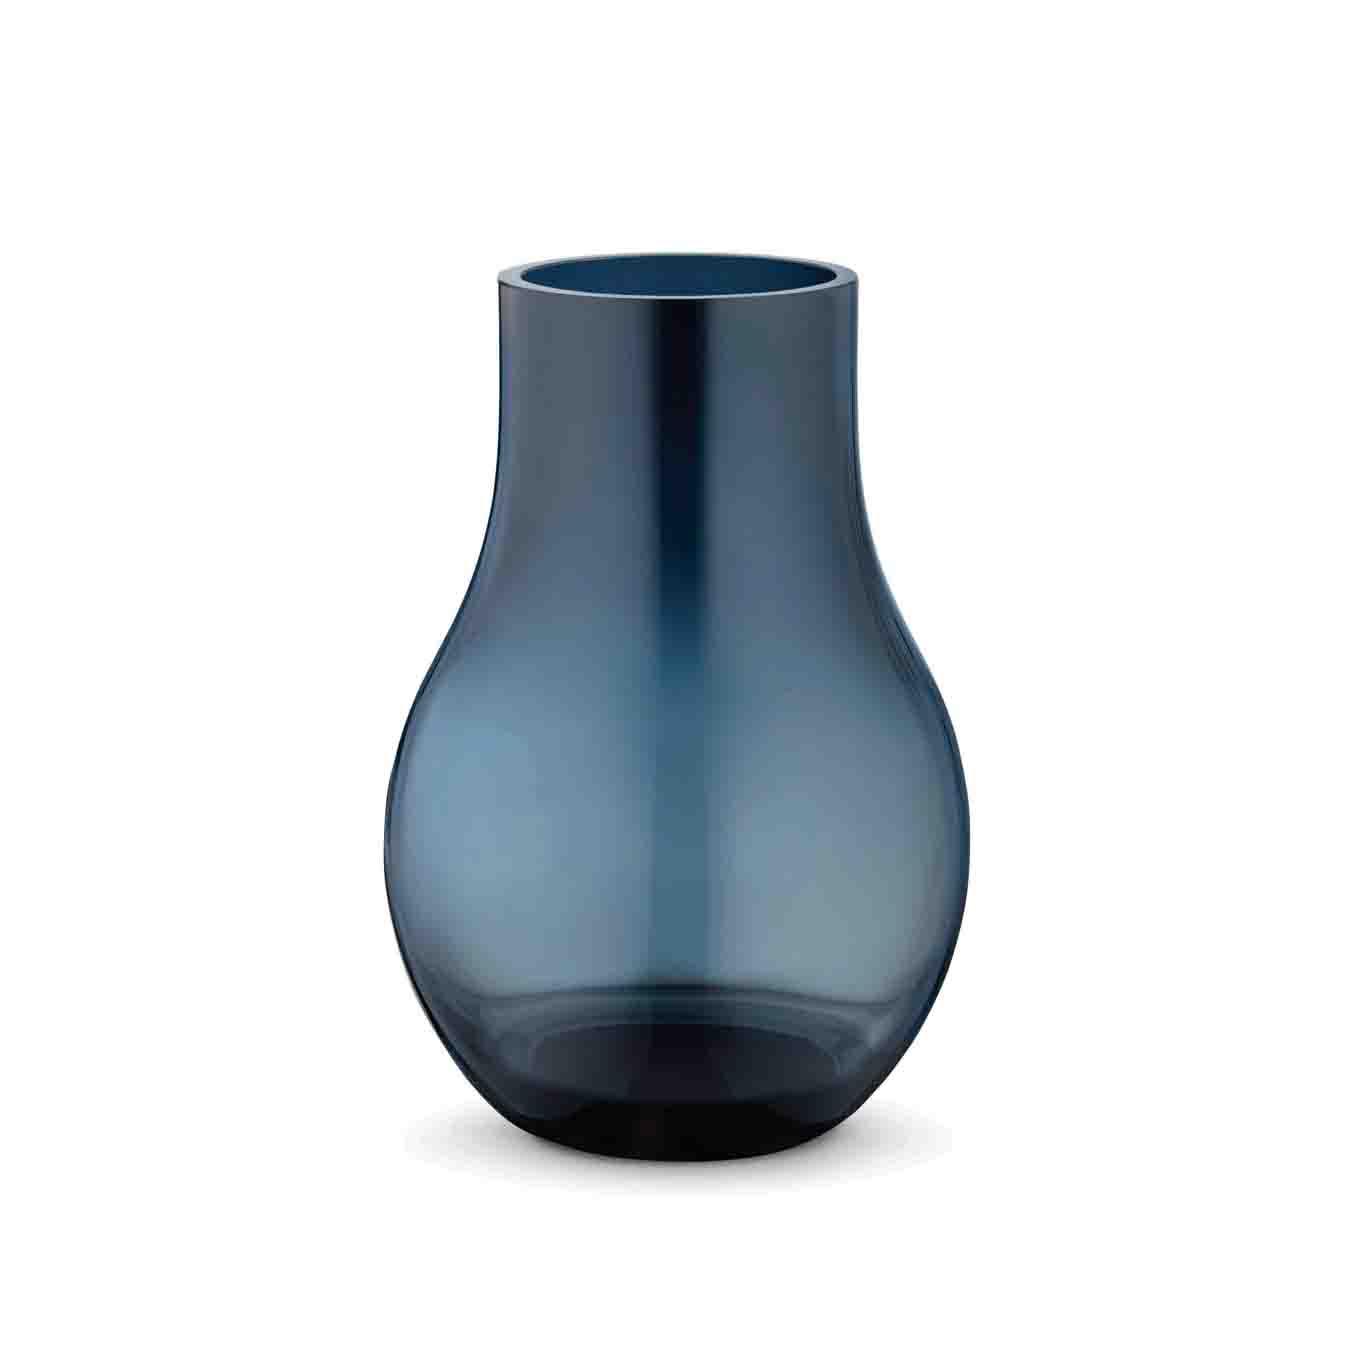 LIVING GEORG JENSEN CAFU系列 - 手工玻璃花器(中型) 建議售價NT$4,000